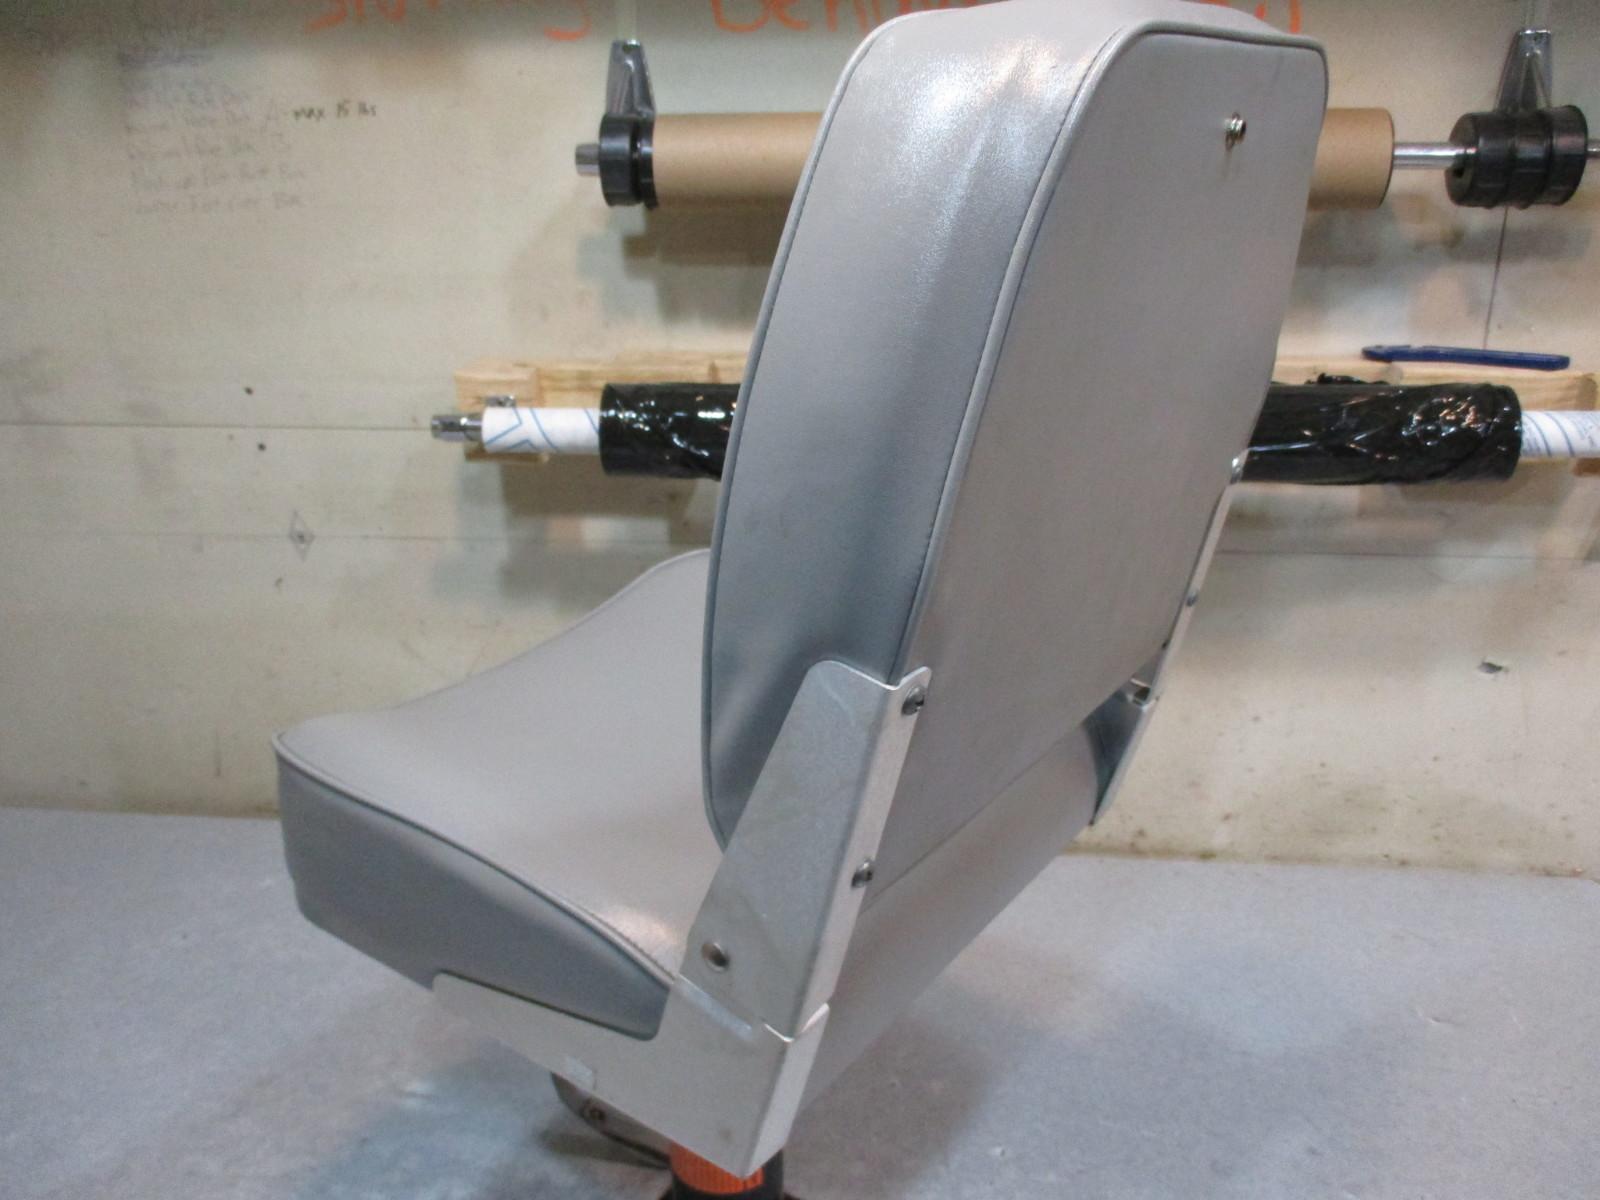 Marine Boat Folding Grey Seat With Swivel Pedestal